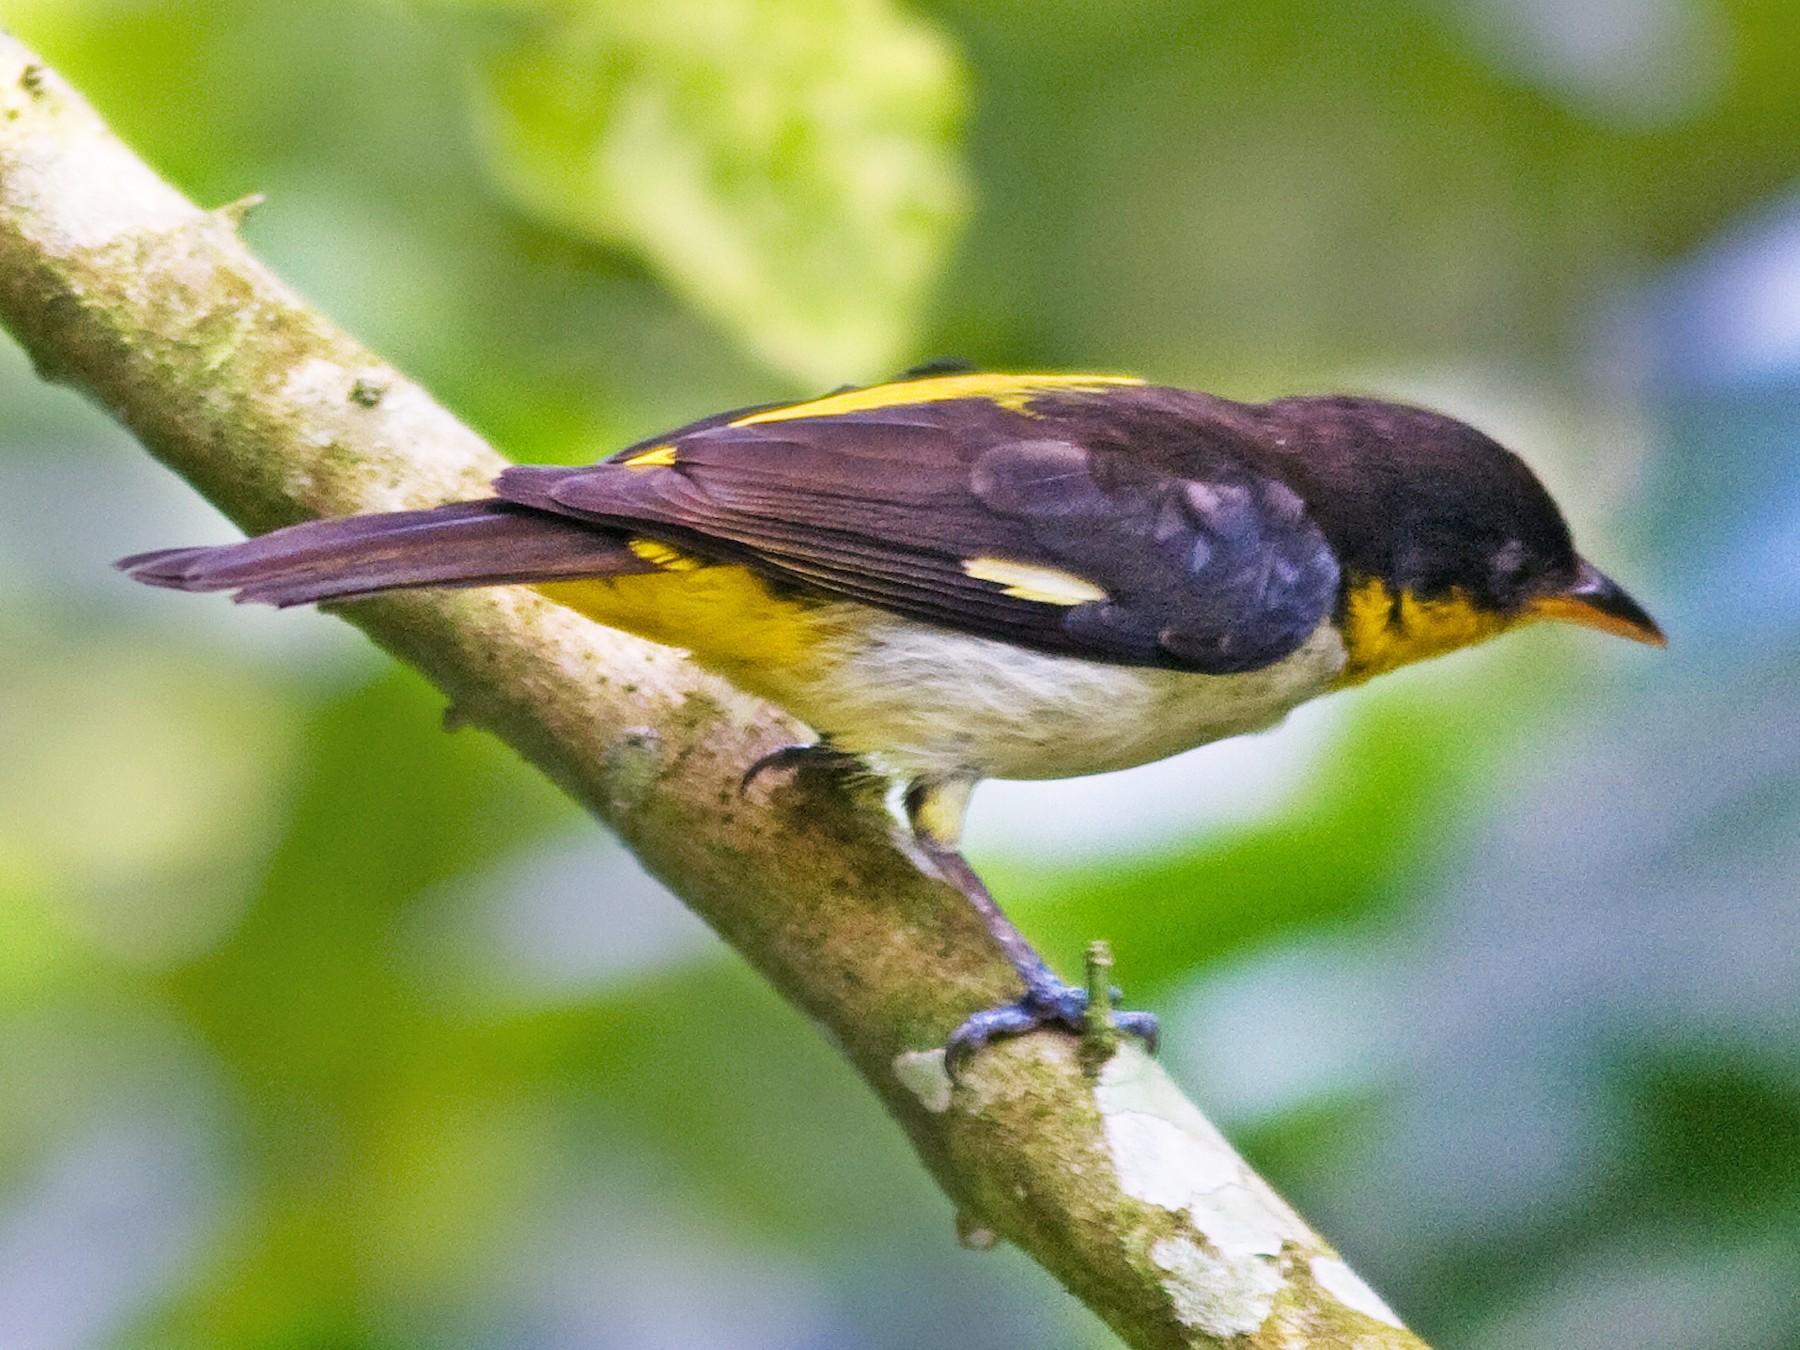 Yellow-backed Tanager - Marbry Hopkins